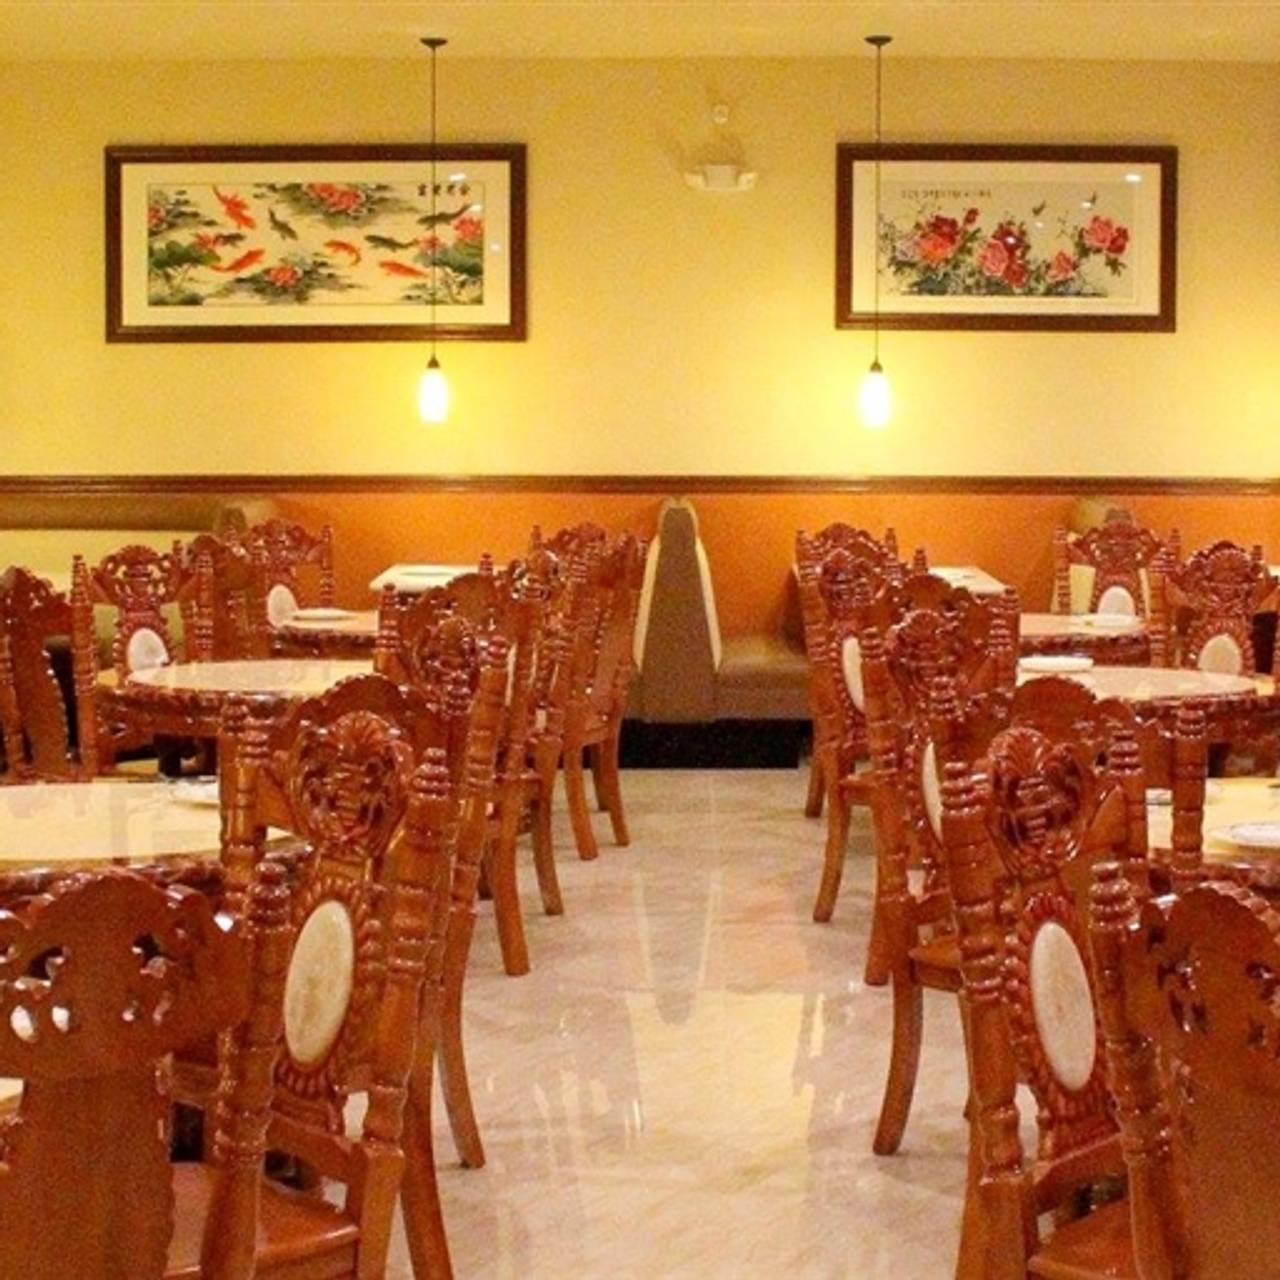 Cie Sichuan Cuisine Restaurant Indio Ca Opentable